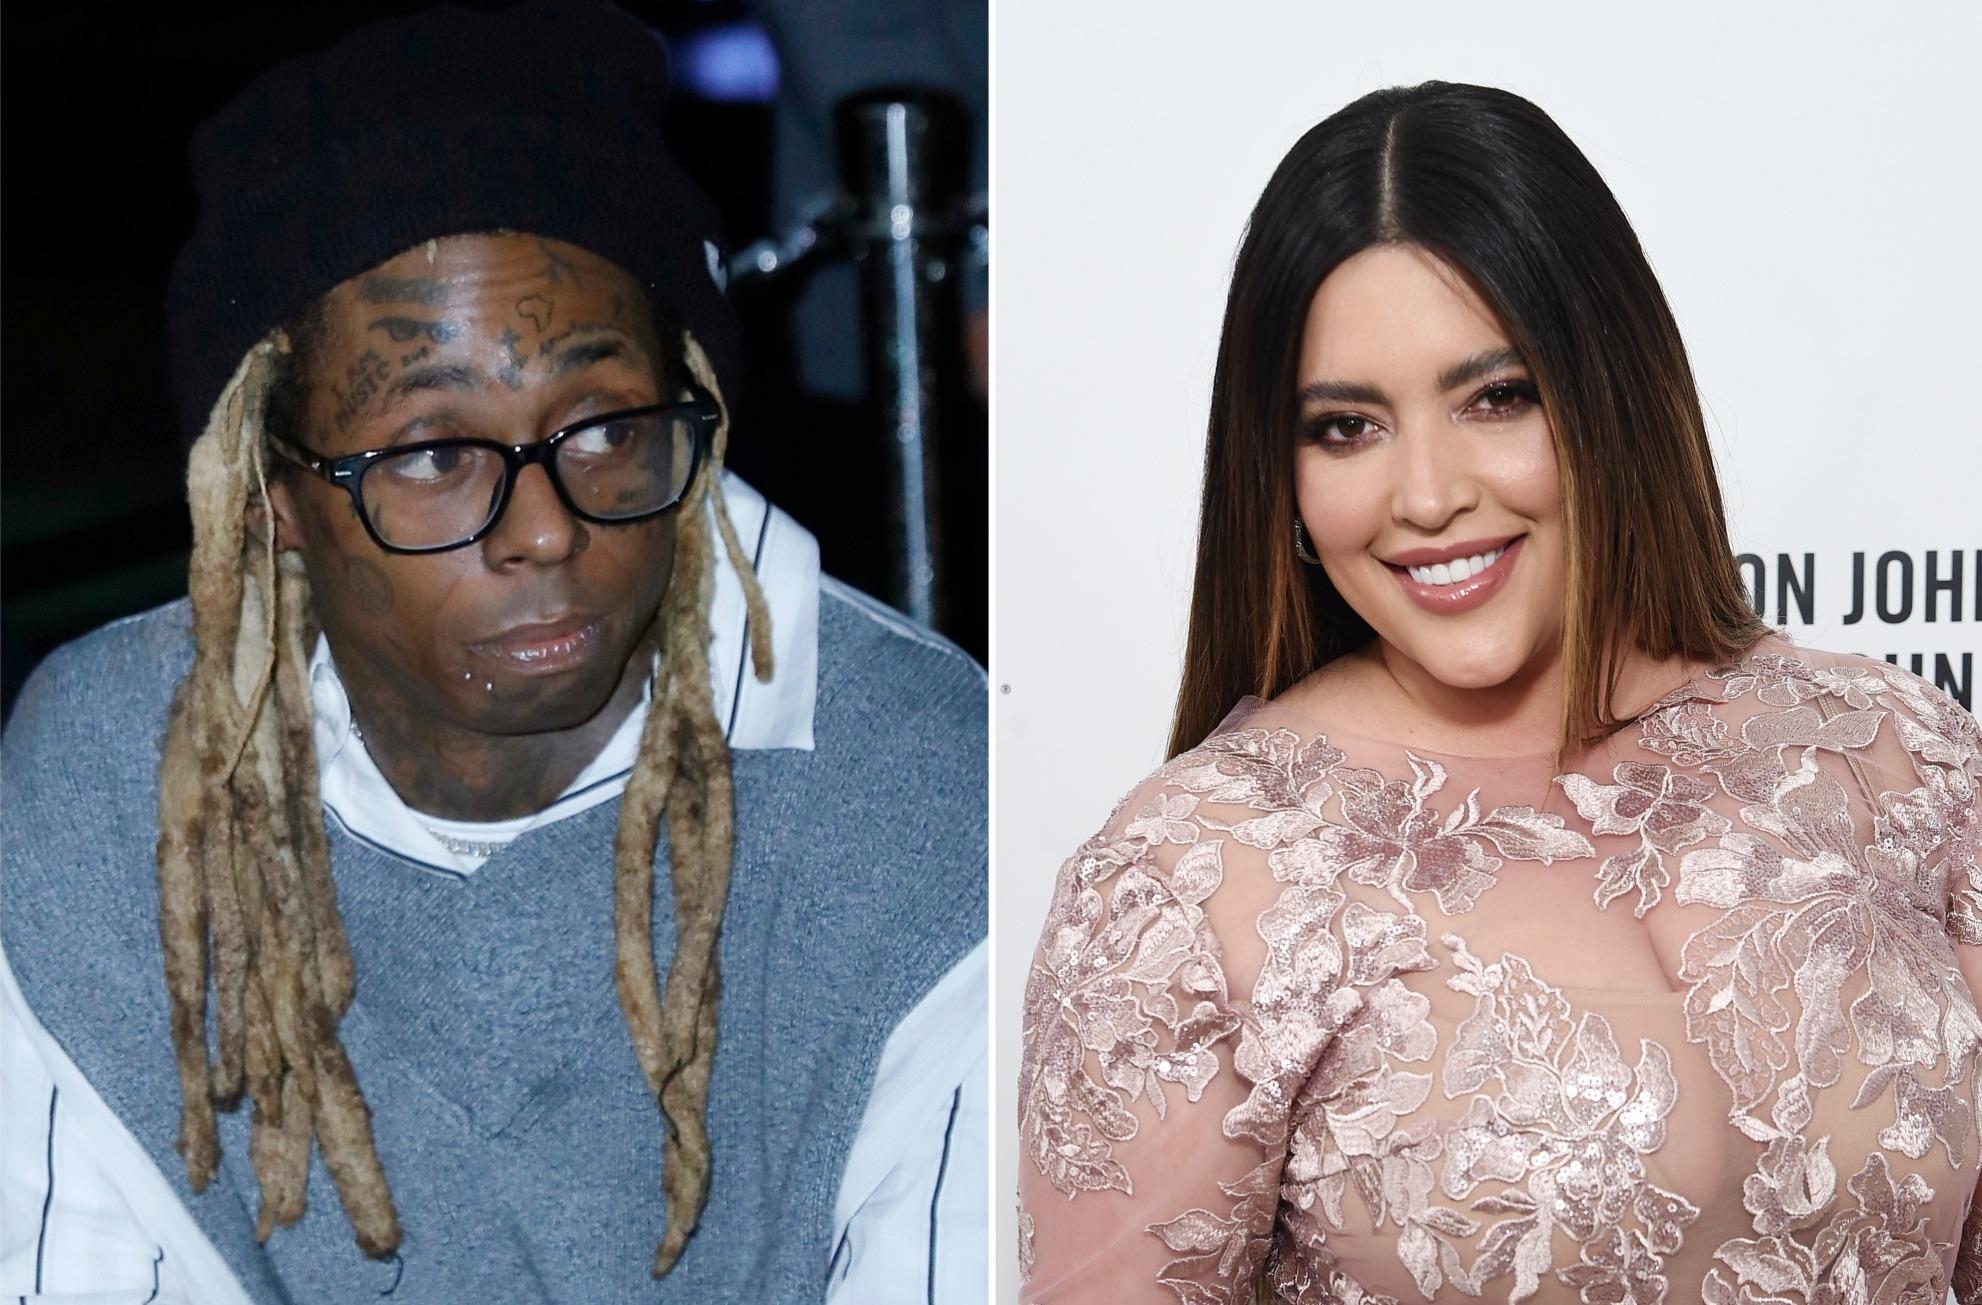 Lil Waynes model girlfriend dumps rapper over Trump